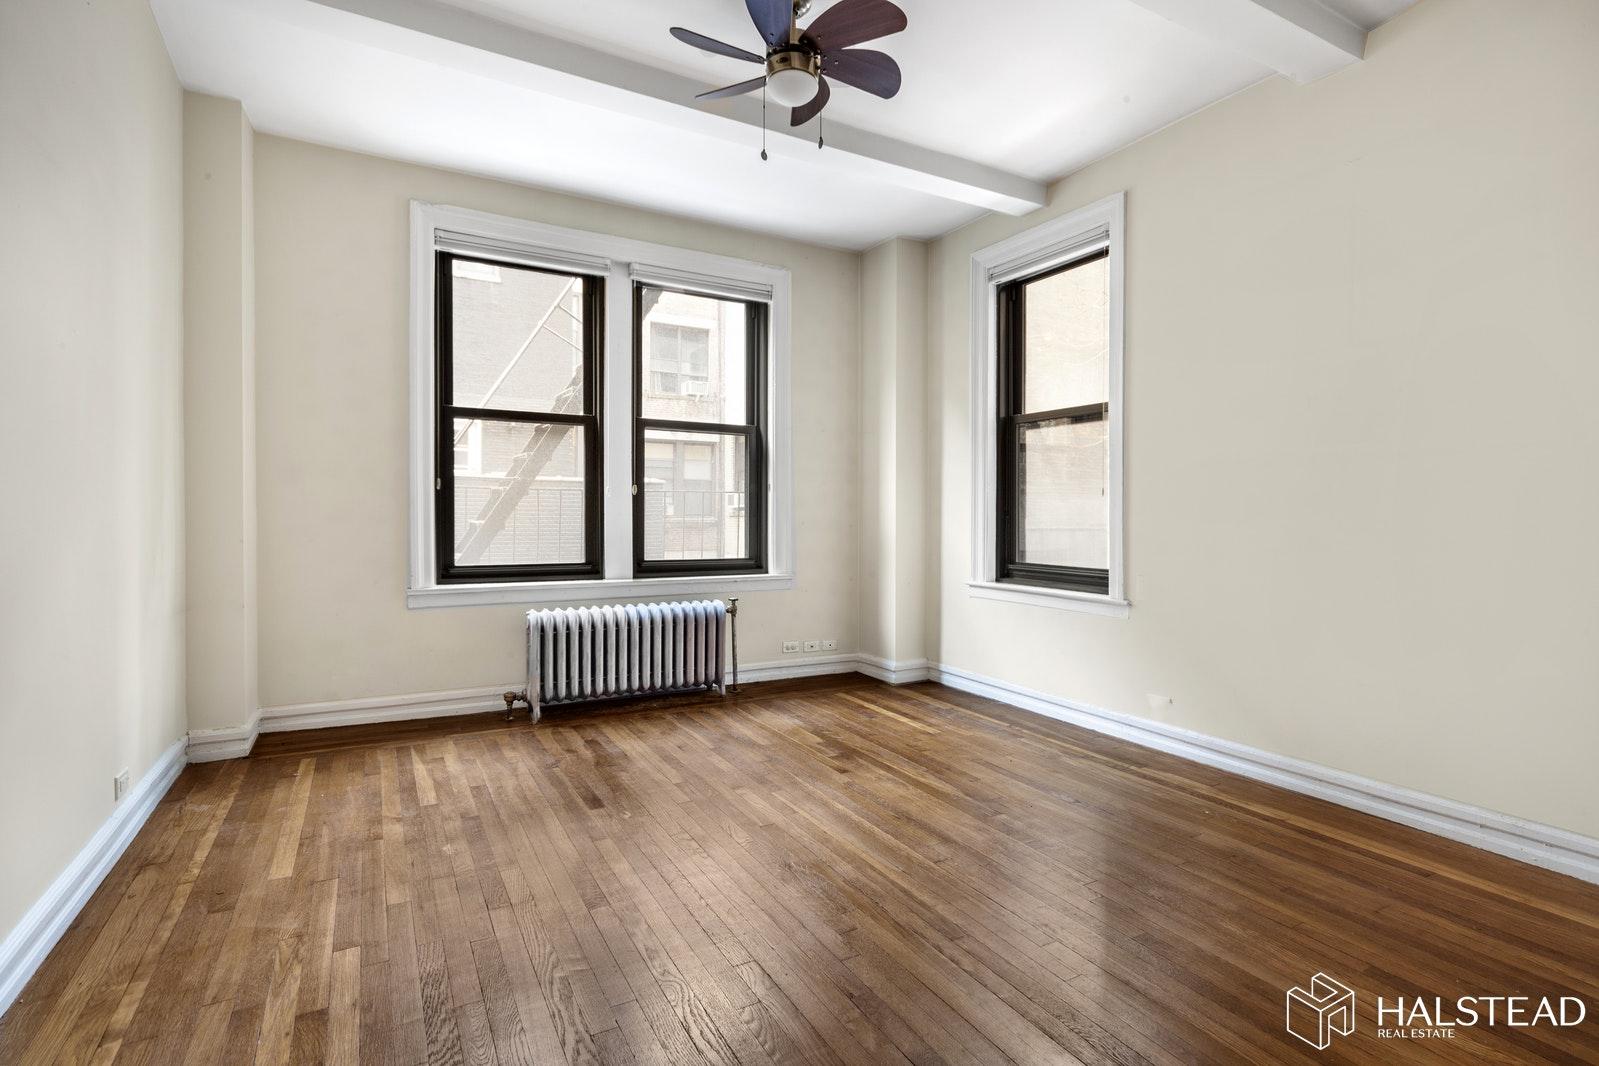 310 WEST 106TH STREET 2C, Upper West Side, $725,000, Web #: 19192228